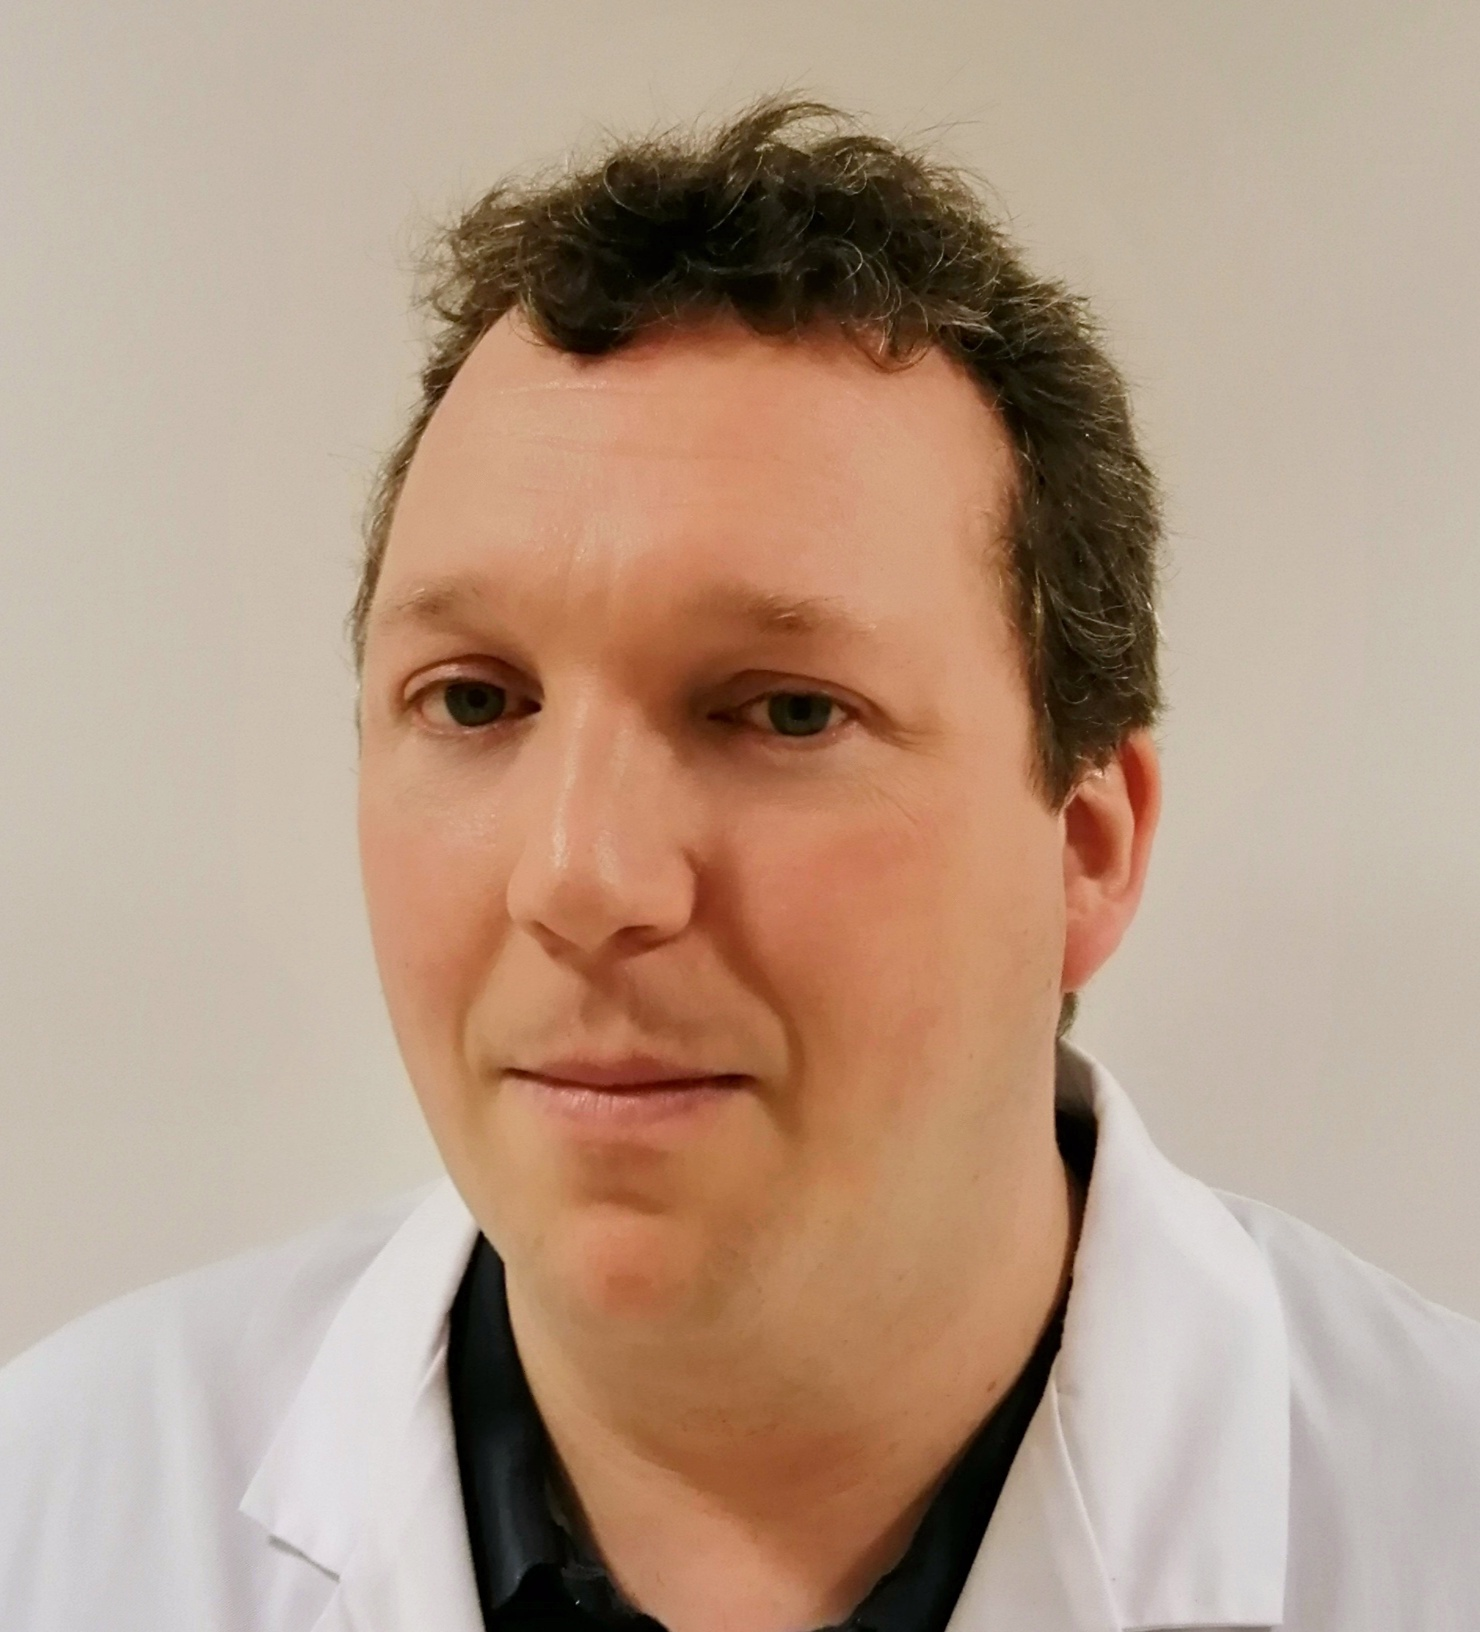 Dott. Enrico Heffler